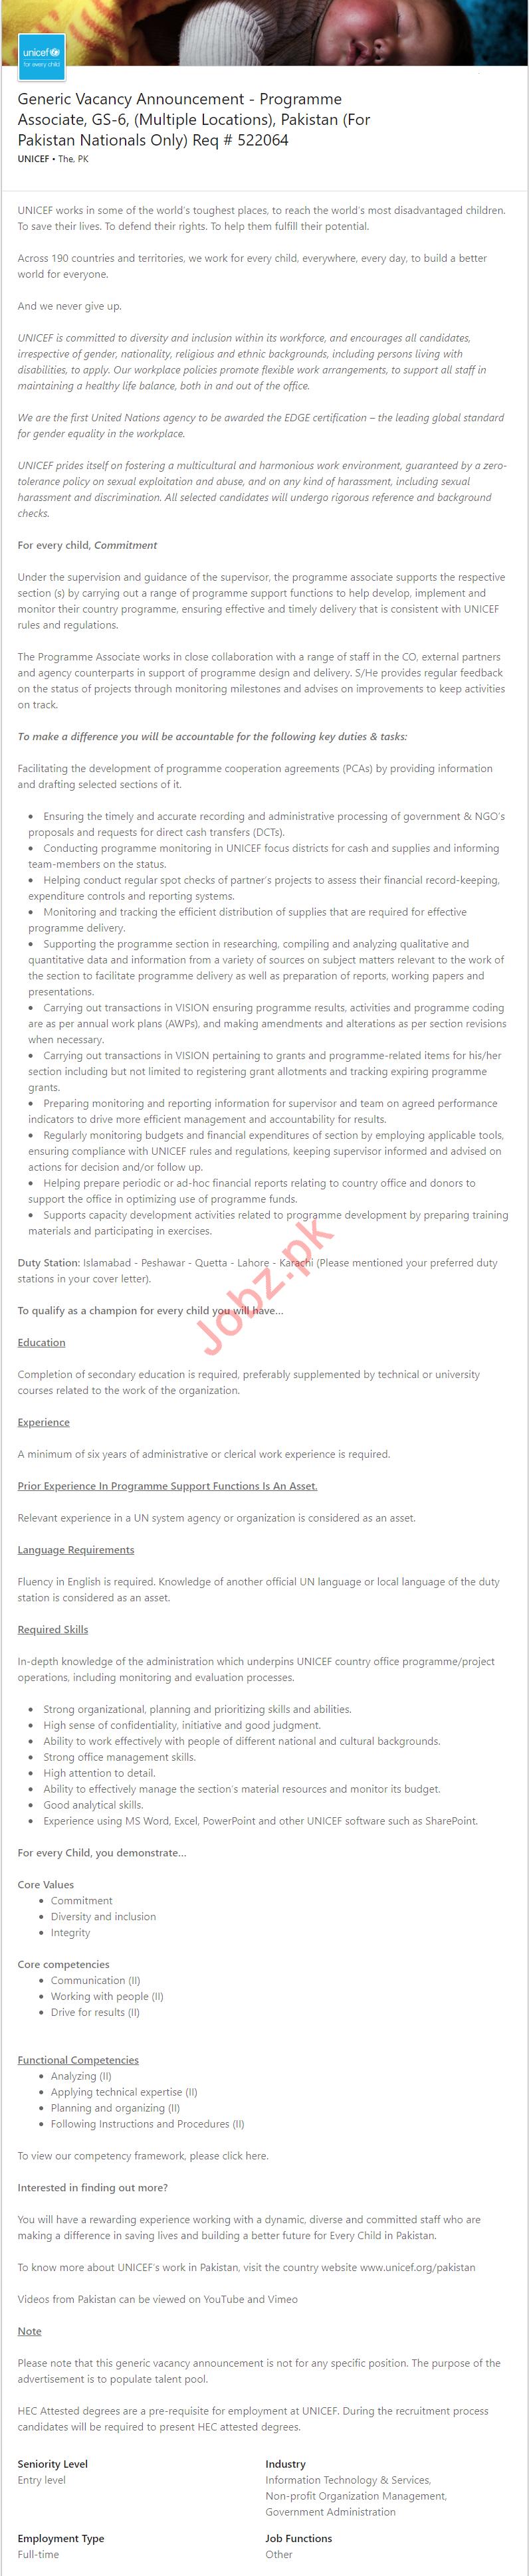 Unicef Pakistan Jobs 2019 for Programme Associate